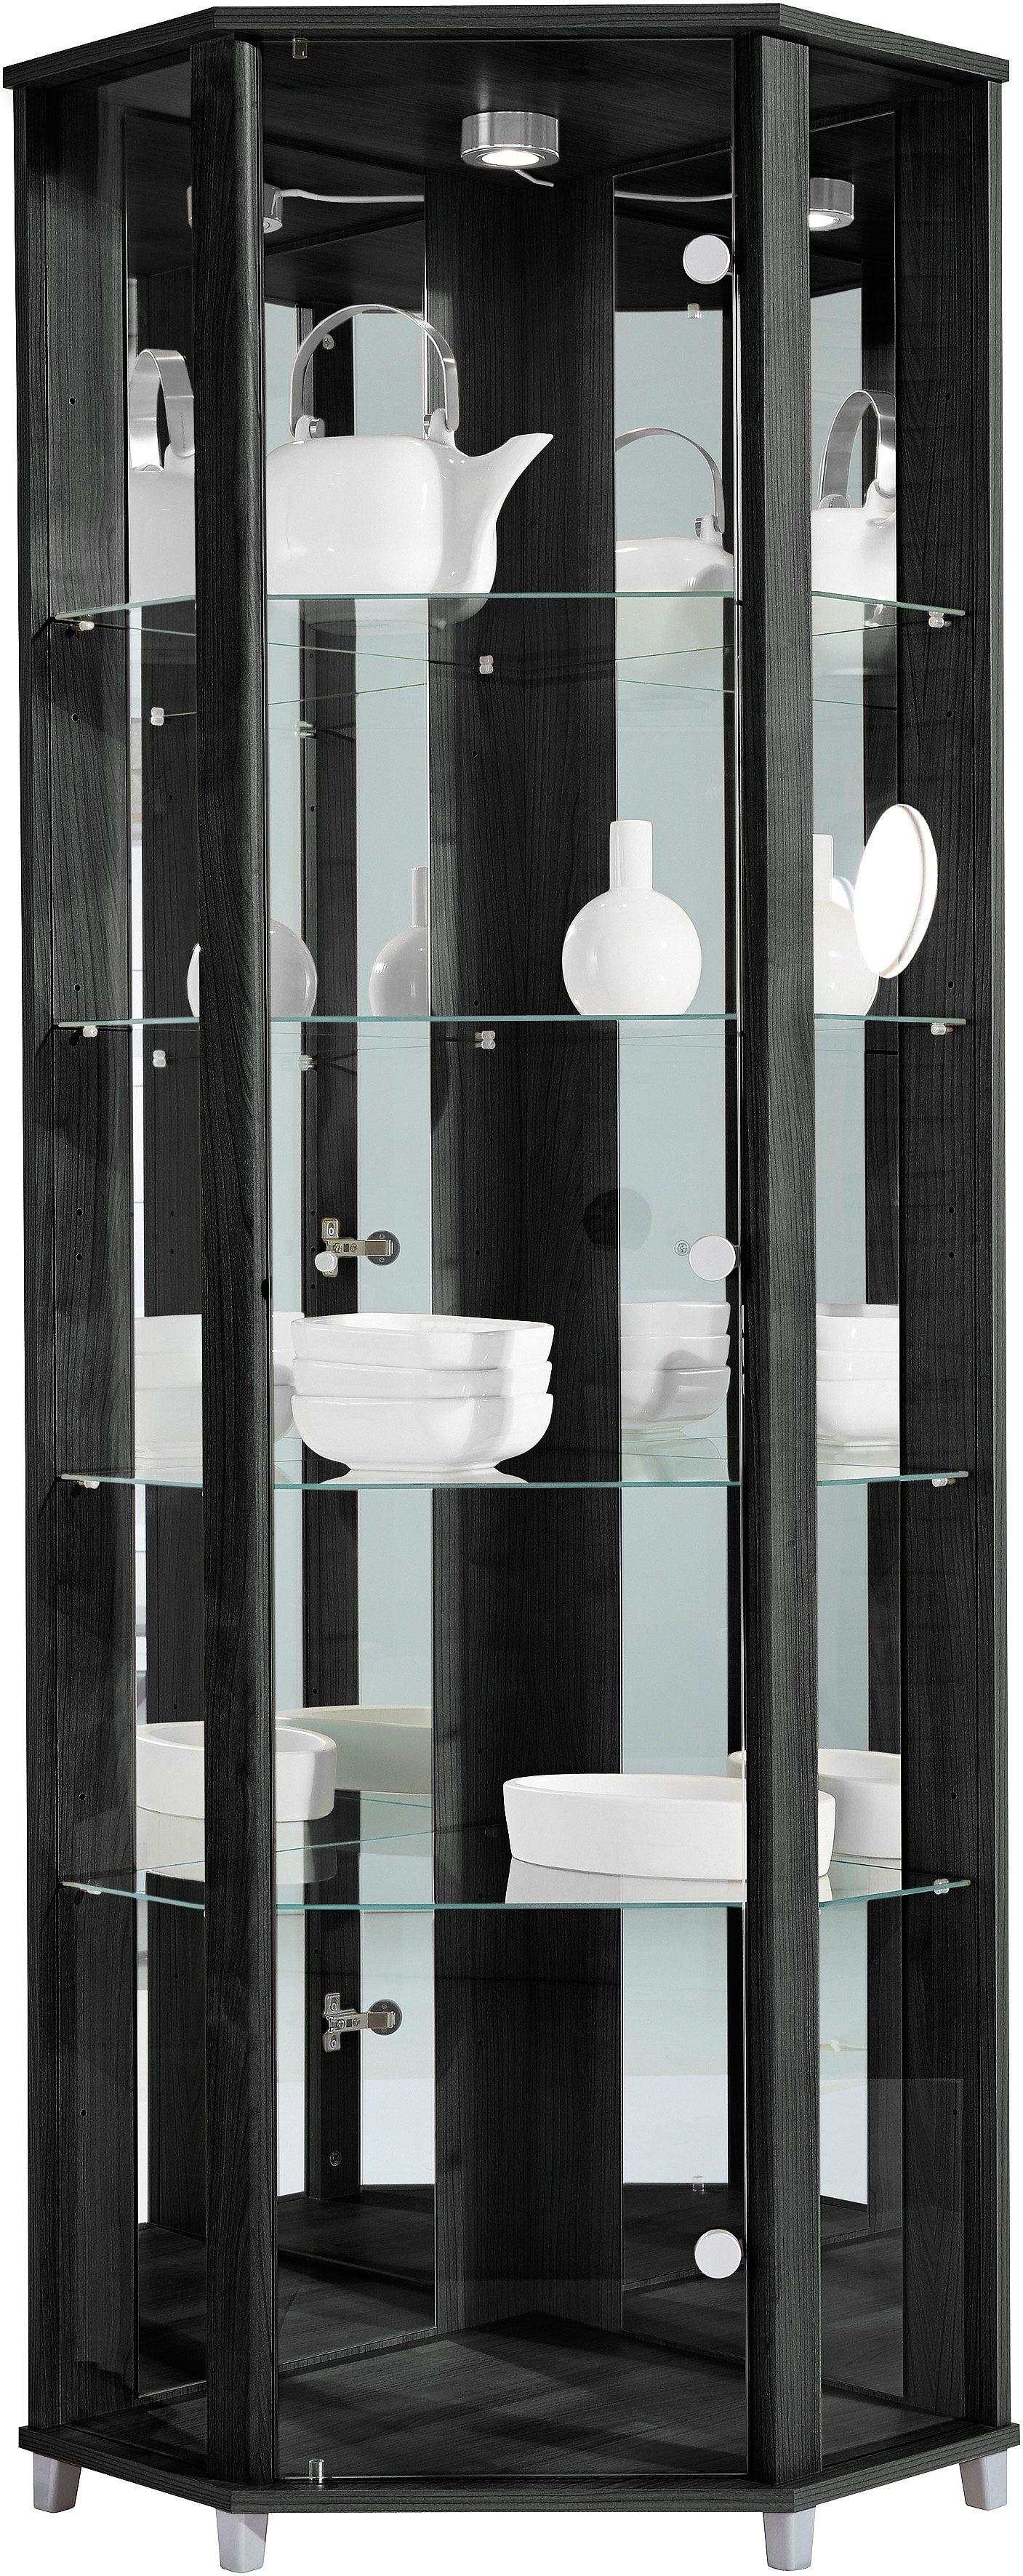 Eckvitrine, Höhe 172 cm, 4 Glasböden | Wohnzimmer > Vitrinen > Eckvitrinen | Schwarz | Melamin | QUELLE